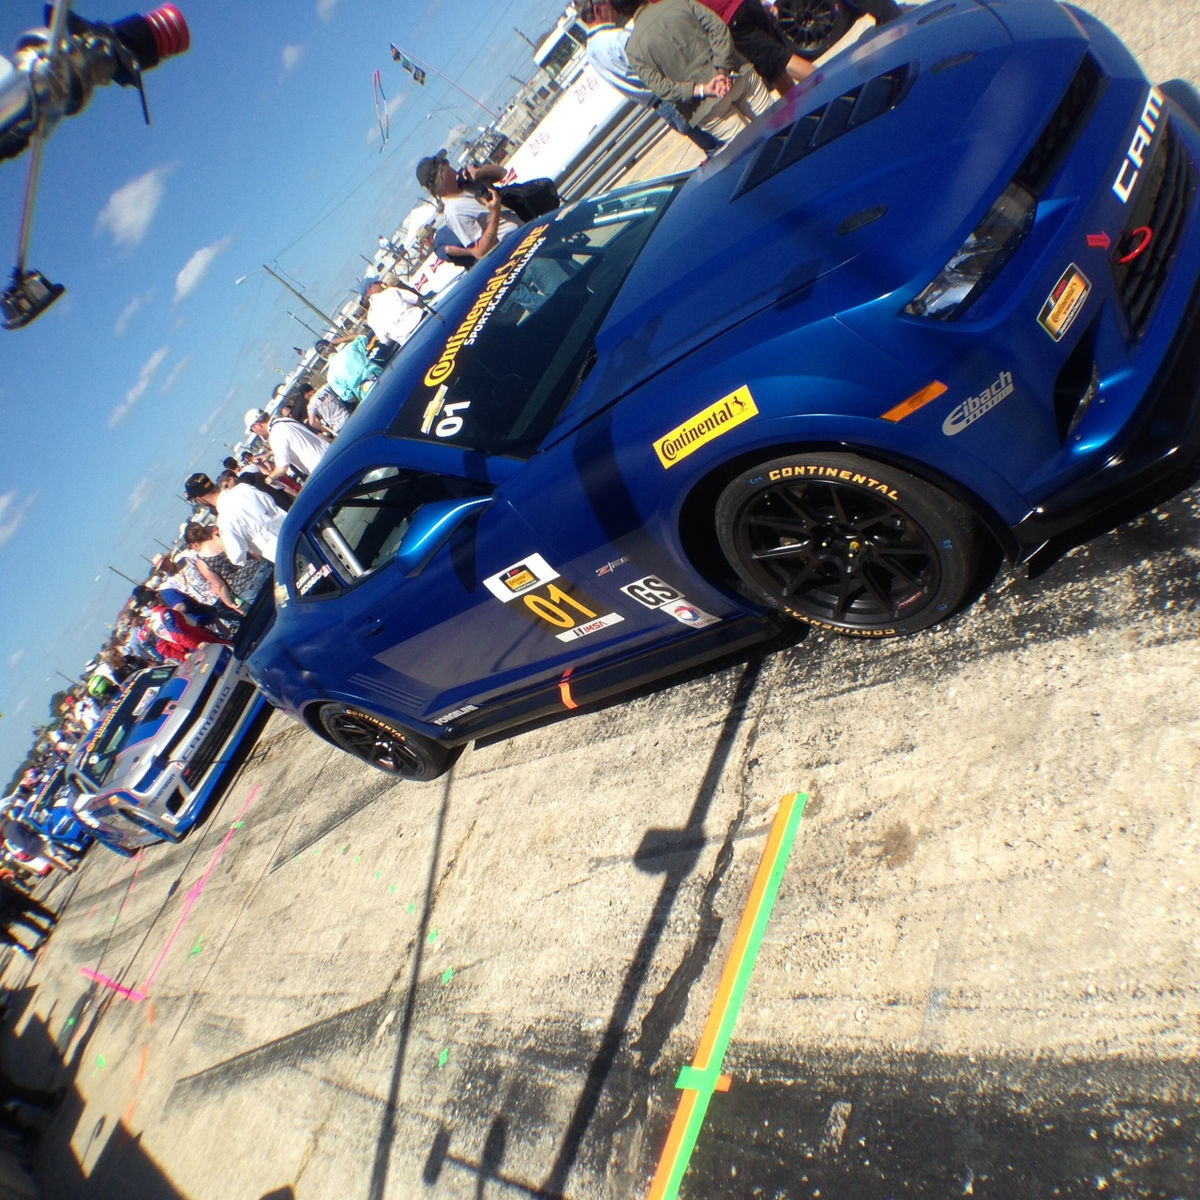 2014 Chevrolet Camaro   CKS Autosport and Stevenson Motorsport Camaro Z28s on the Grid at Sebring